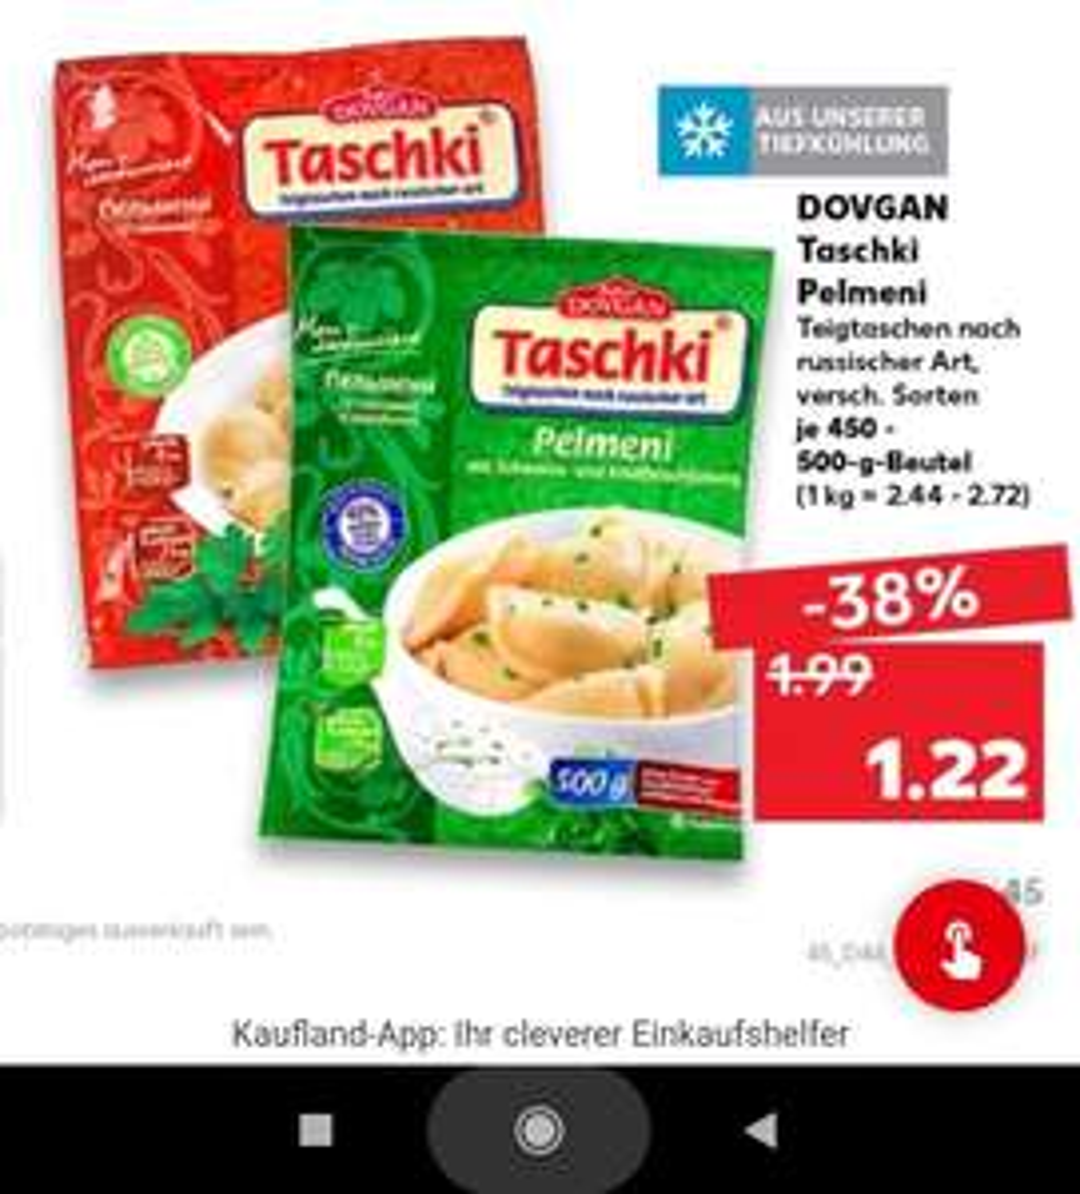 [Kaufland] Ab 18.11.: Taschki Pelmeni zum neuen Bestpreis